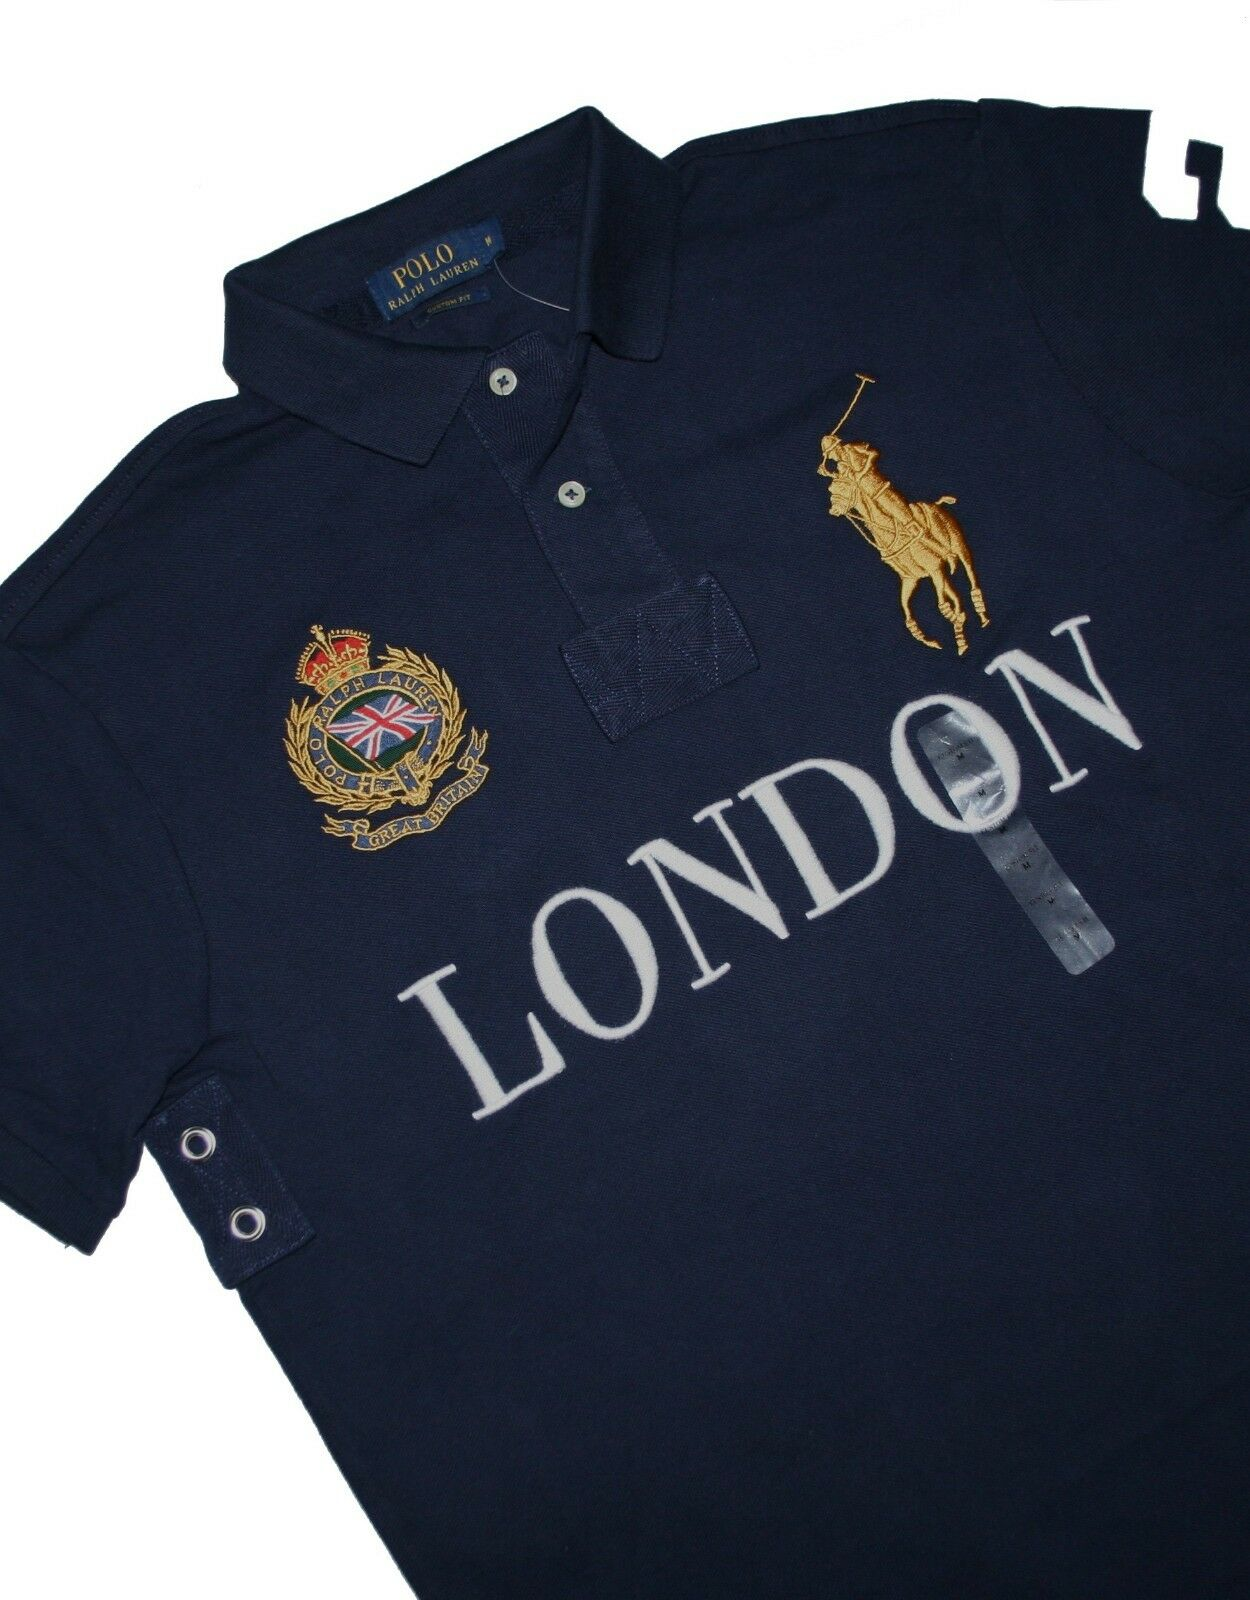 ae1506b6 Ralph Lauren Big Pony London Poloshirt Gr.M, L, XL & XXL ( 2XL ...